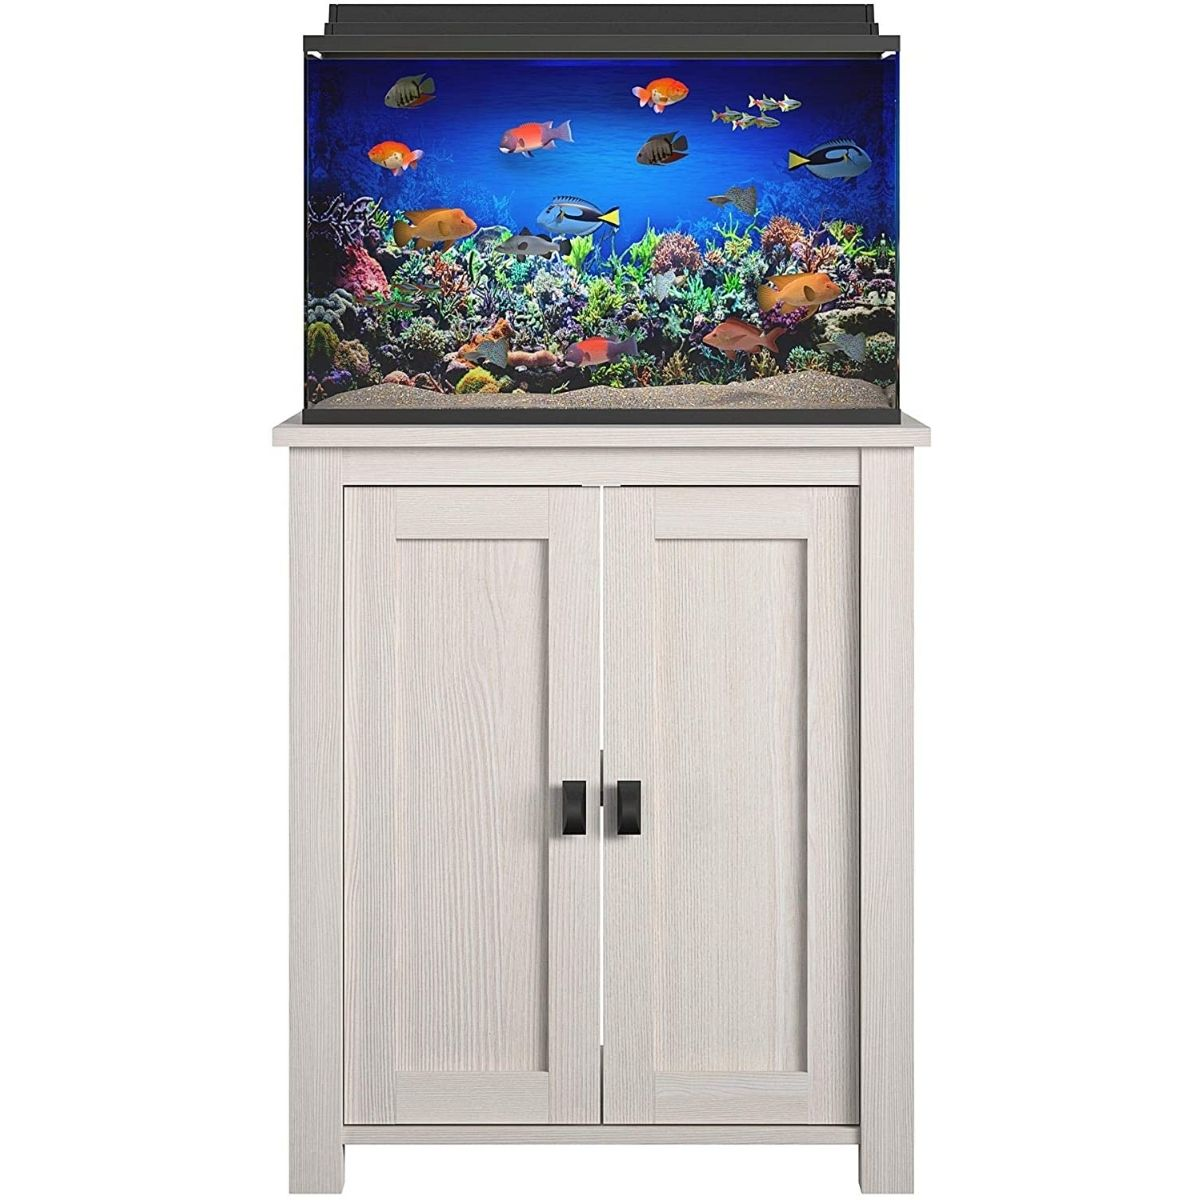 The Best 10 Gallon Fish Tank Stand Option: Ollie & Hutch Farmington 10/20 Gallon Aquarium Stand